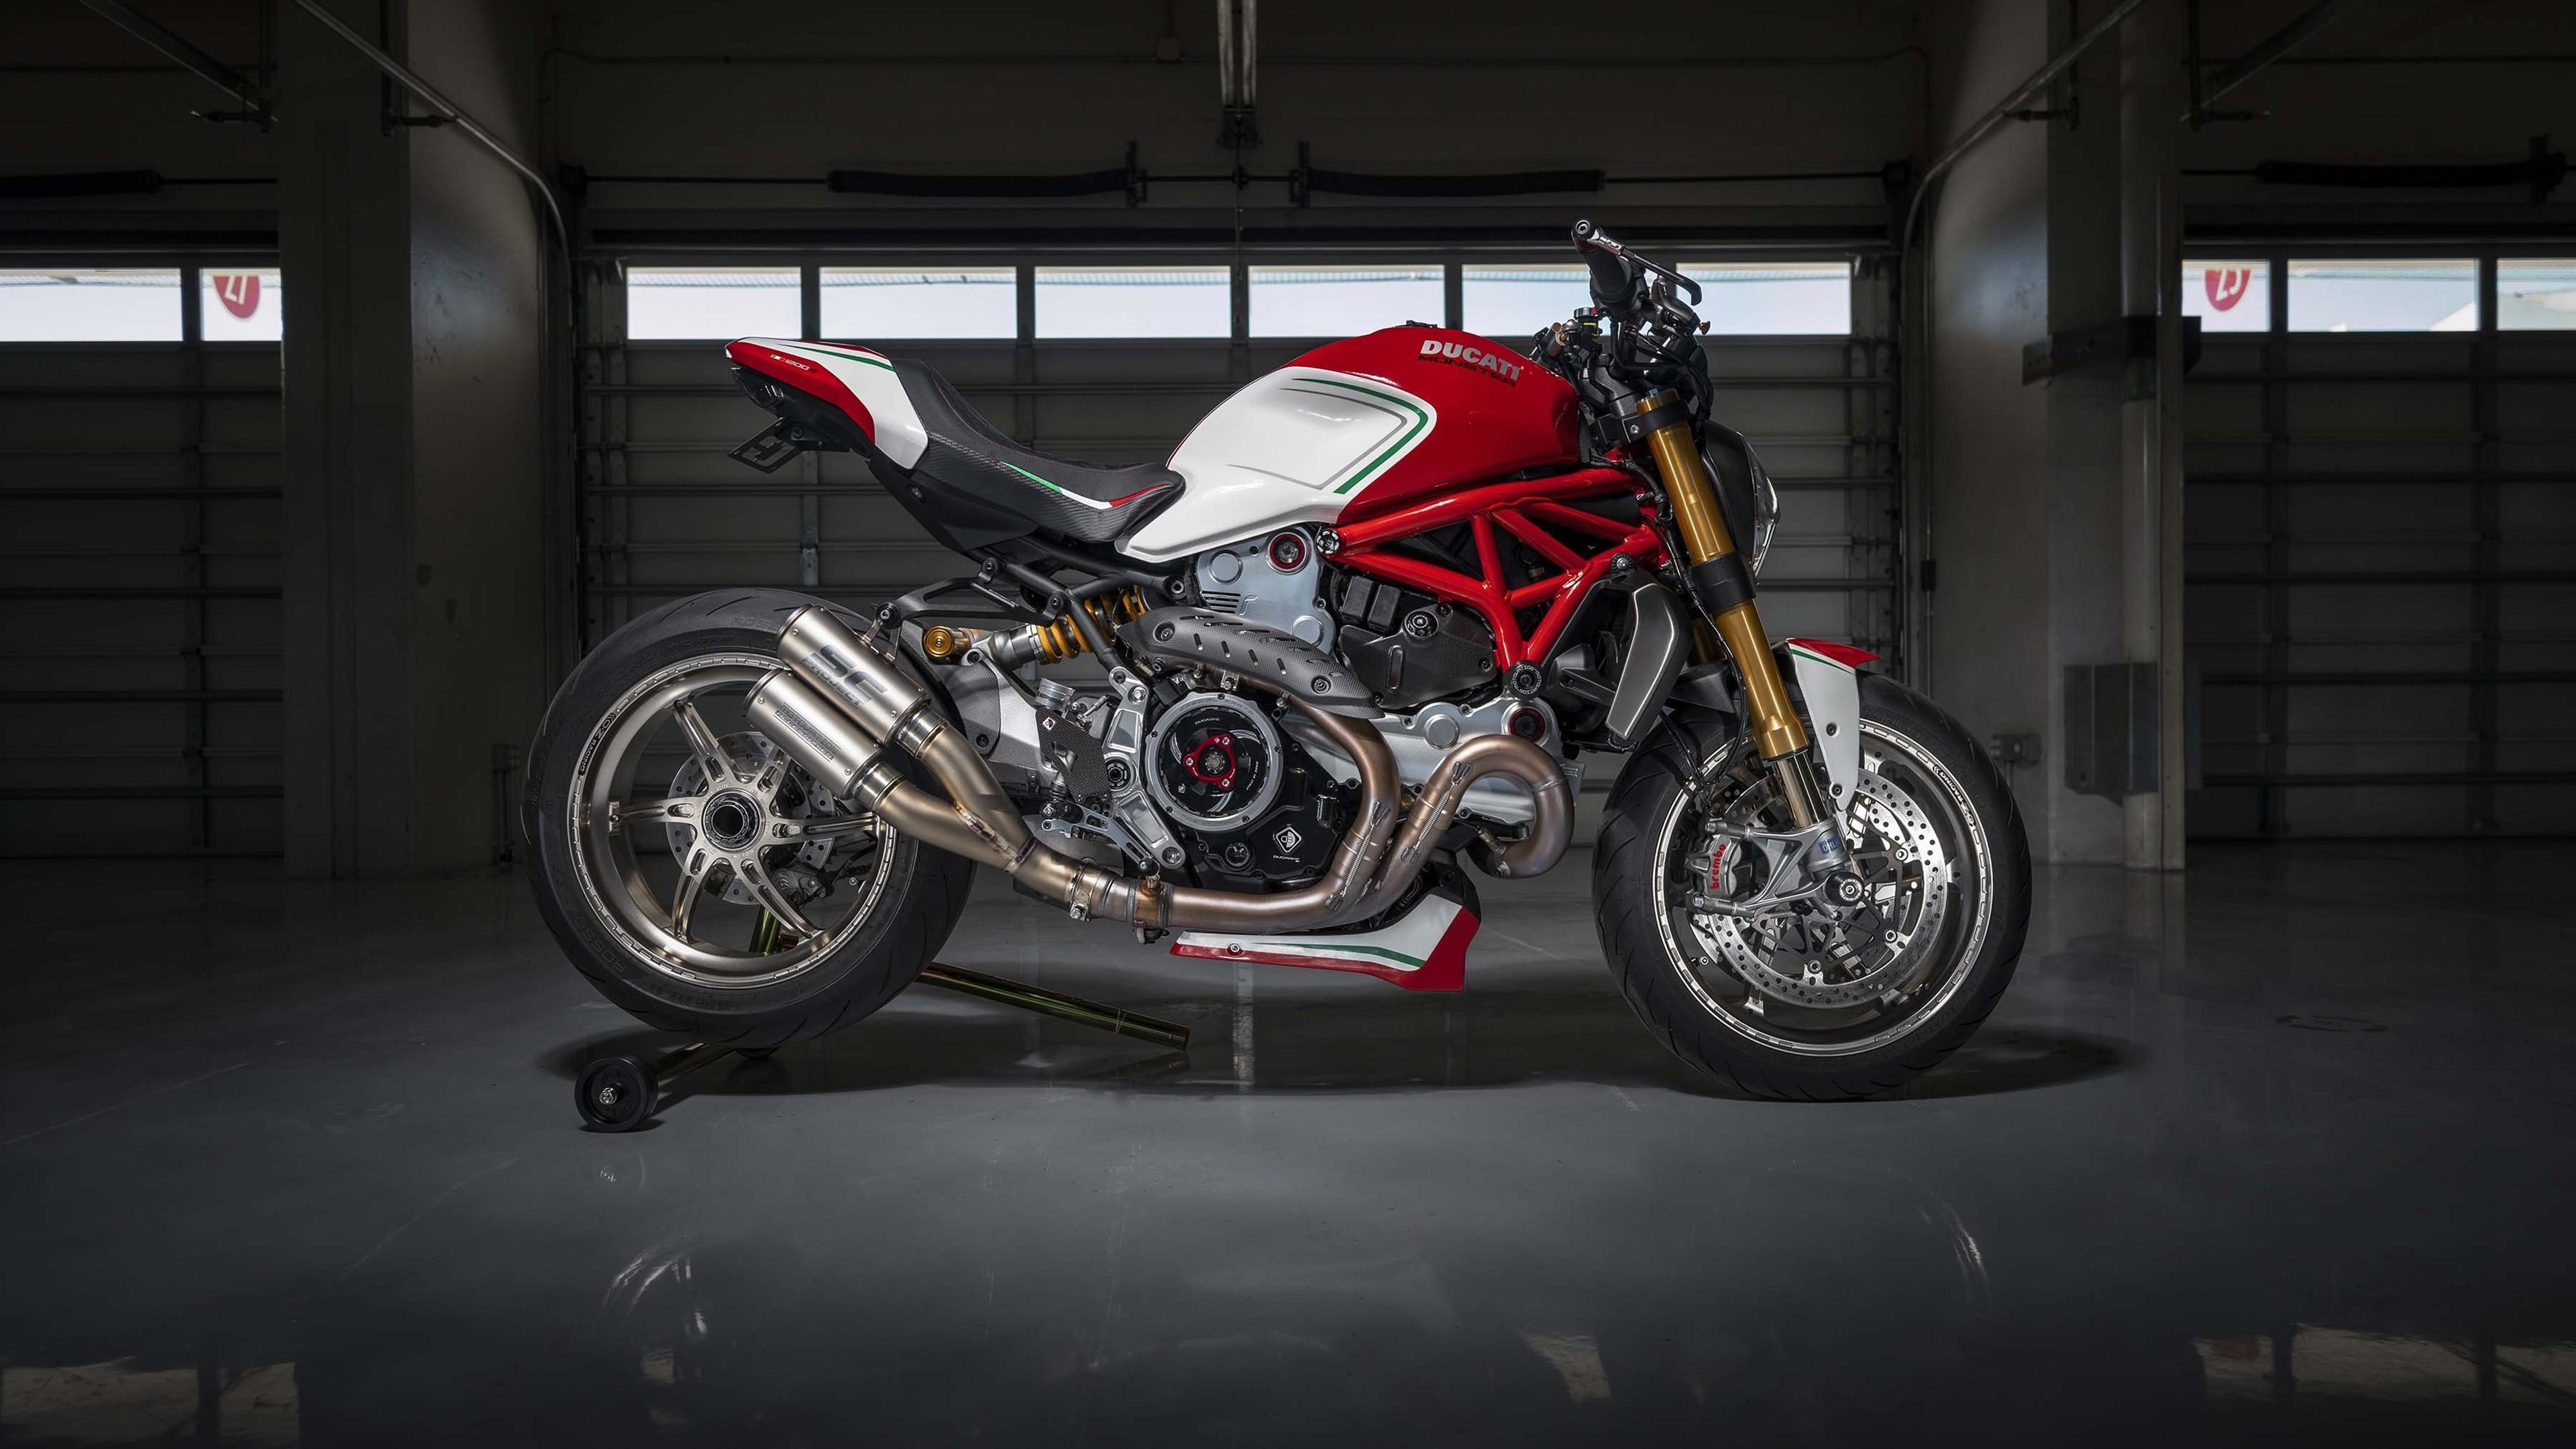 Moto Wallpaper 3d Ducati Monster 1200 Tricolore By Motovation 2019 4k